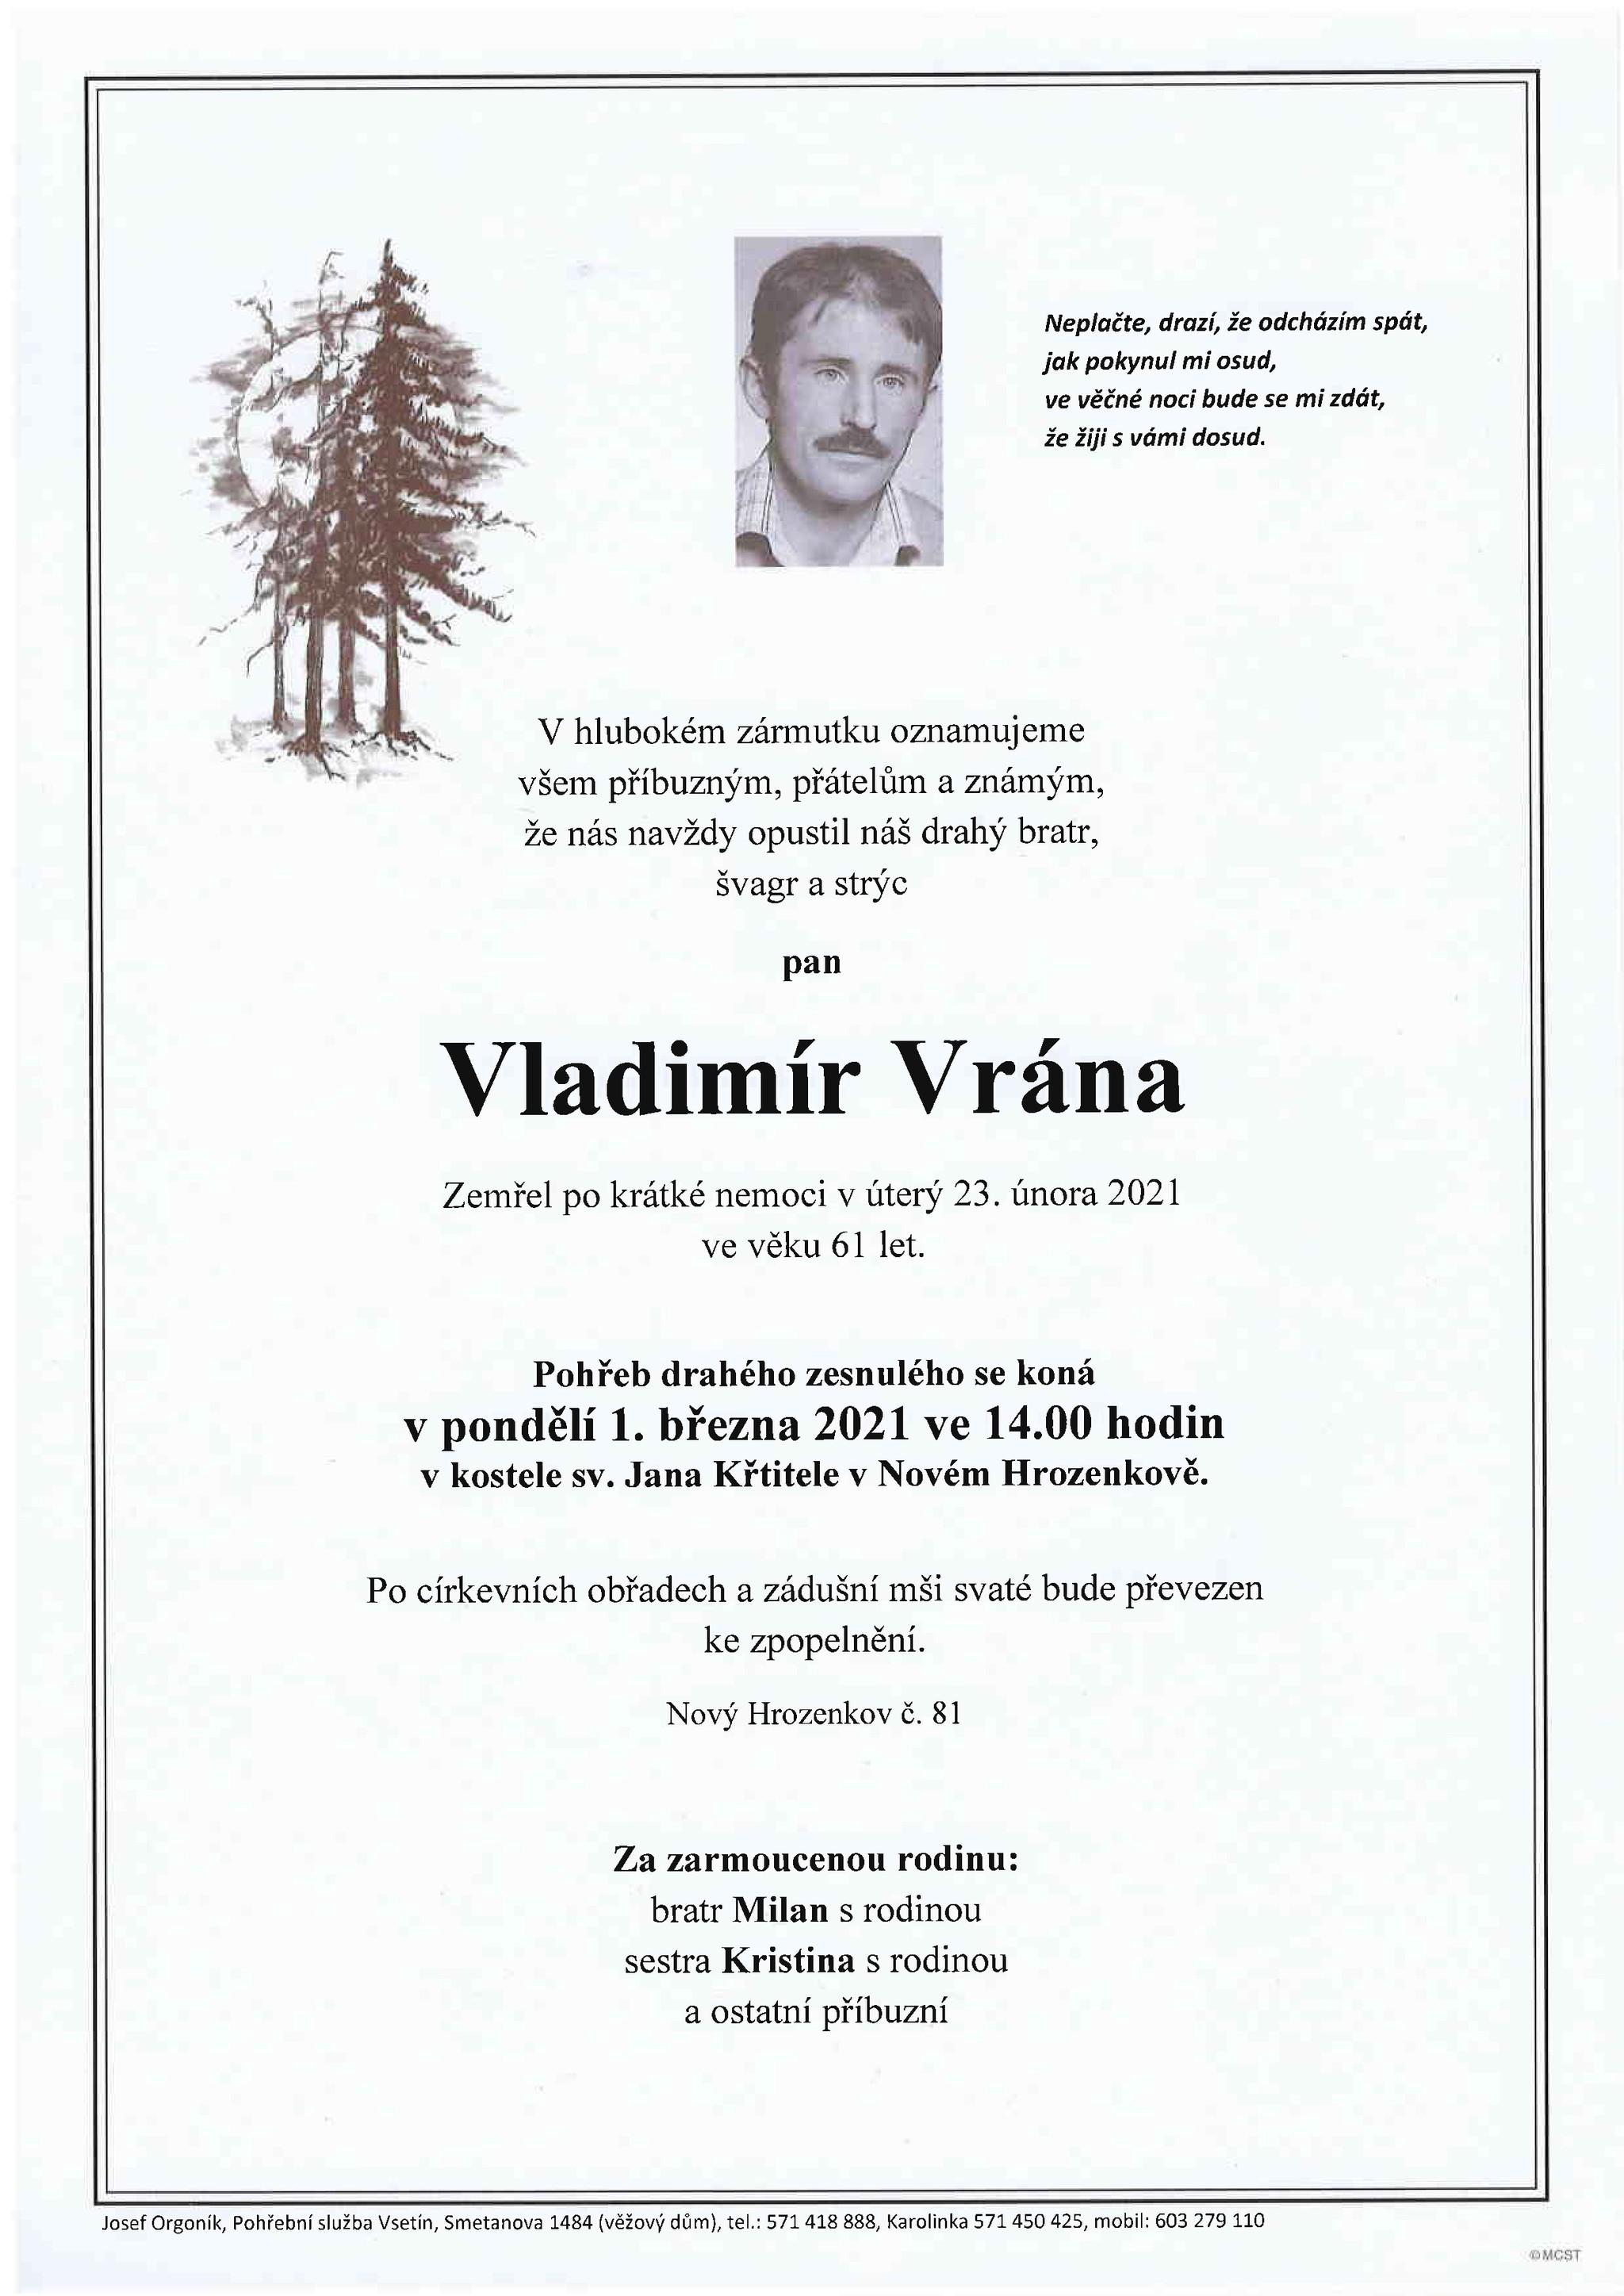 Vladimír Vrána